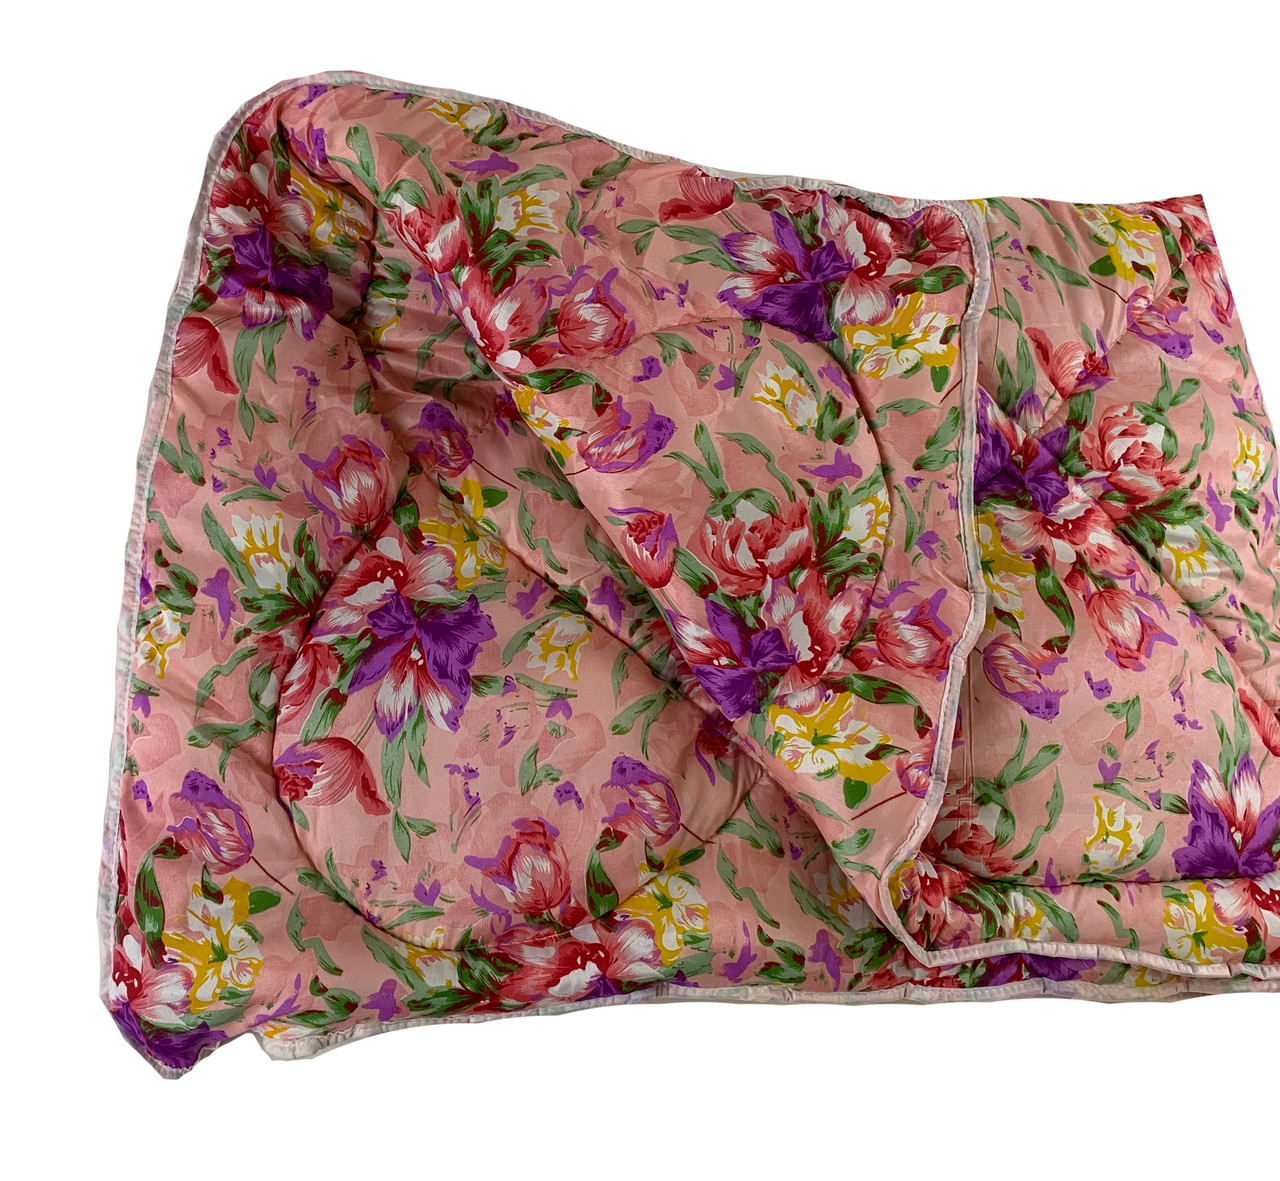 Одеяло двуспальное, холлофайбер 180*220 см, Украина